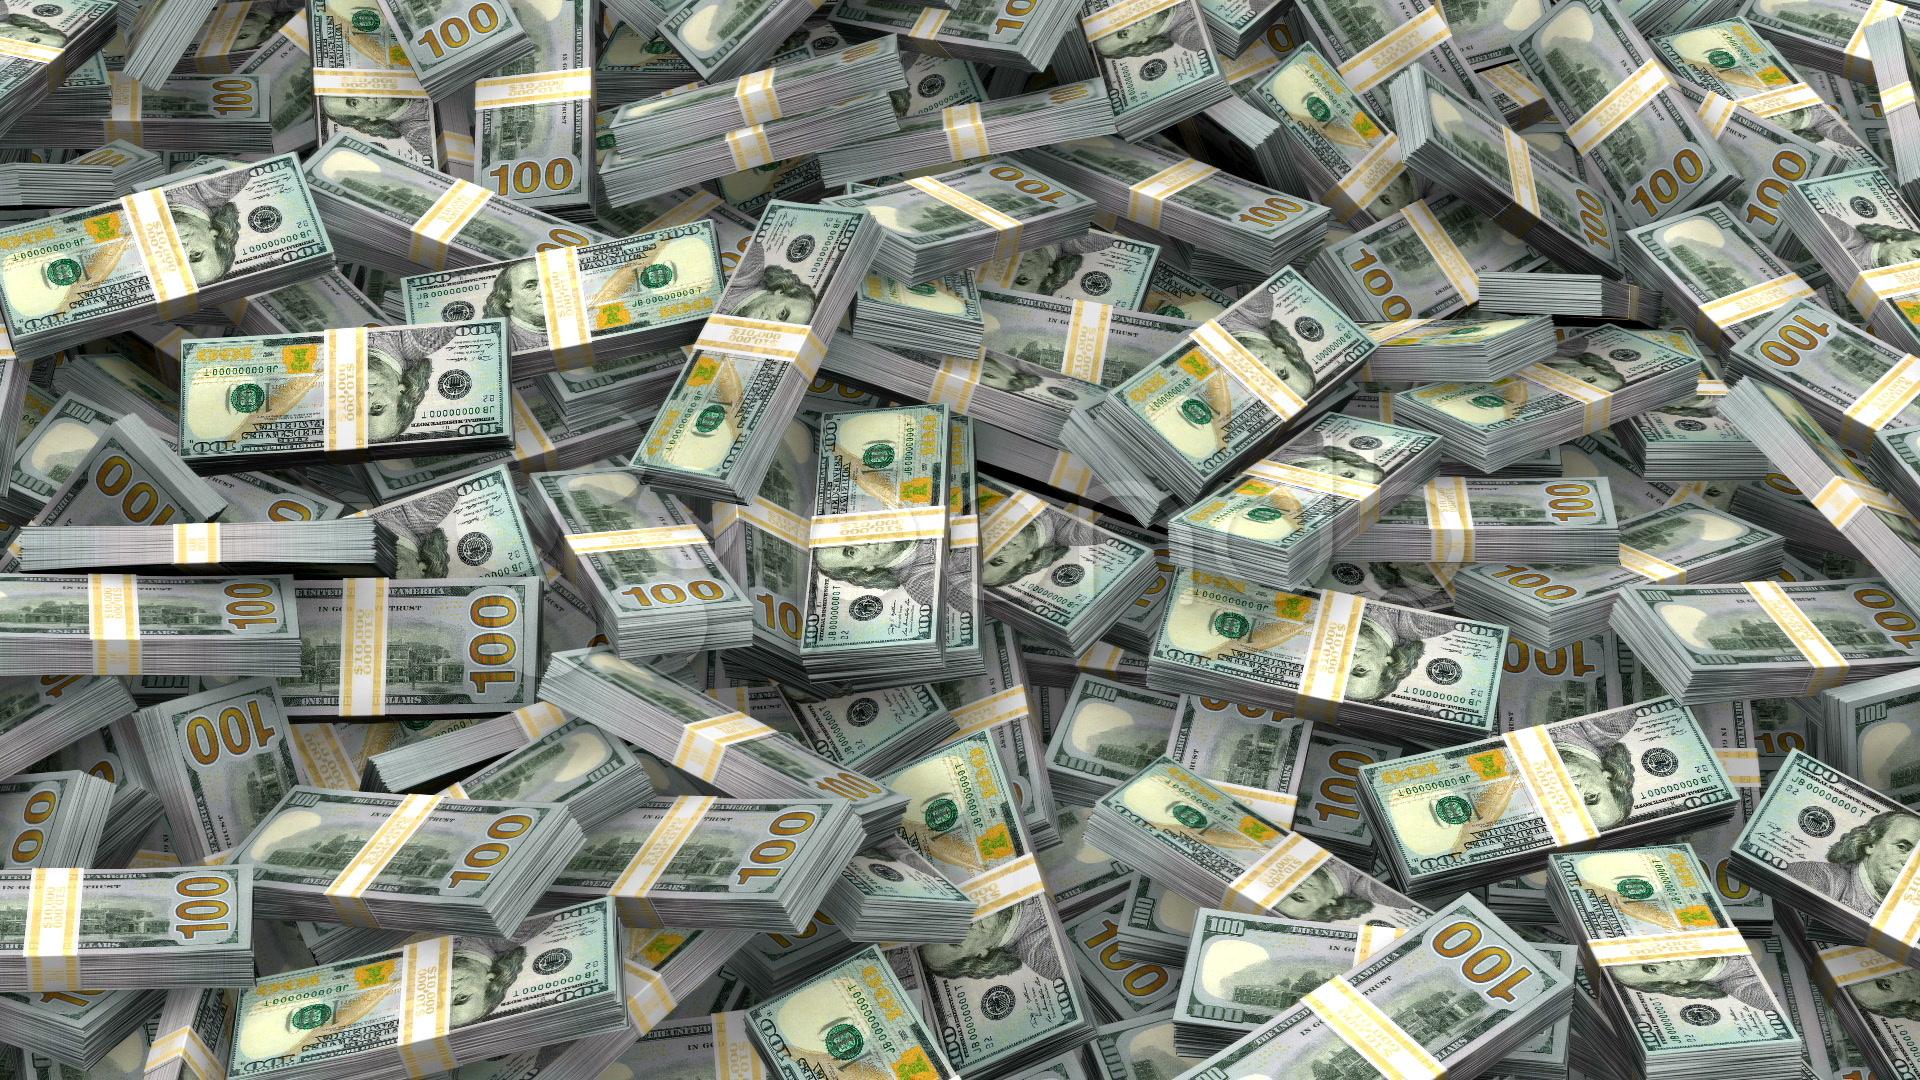 28 Stack Of New 100 Dollar Bills Wallpapers On Wallpapersafari